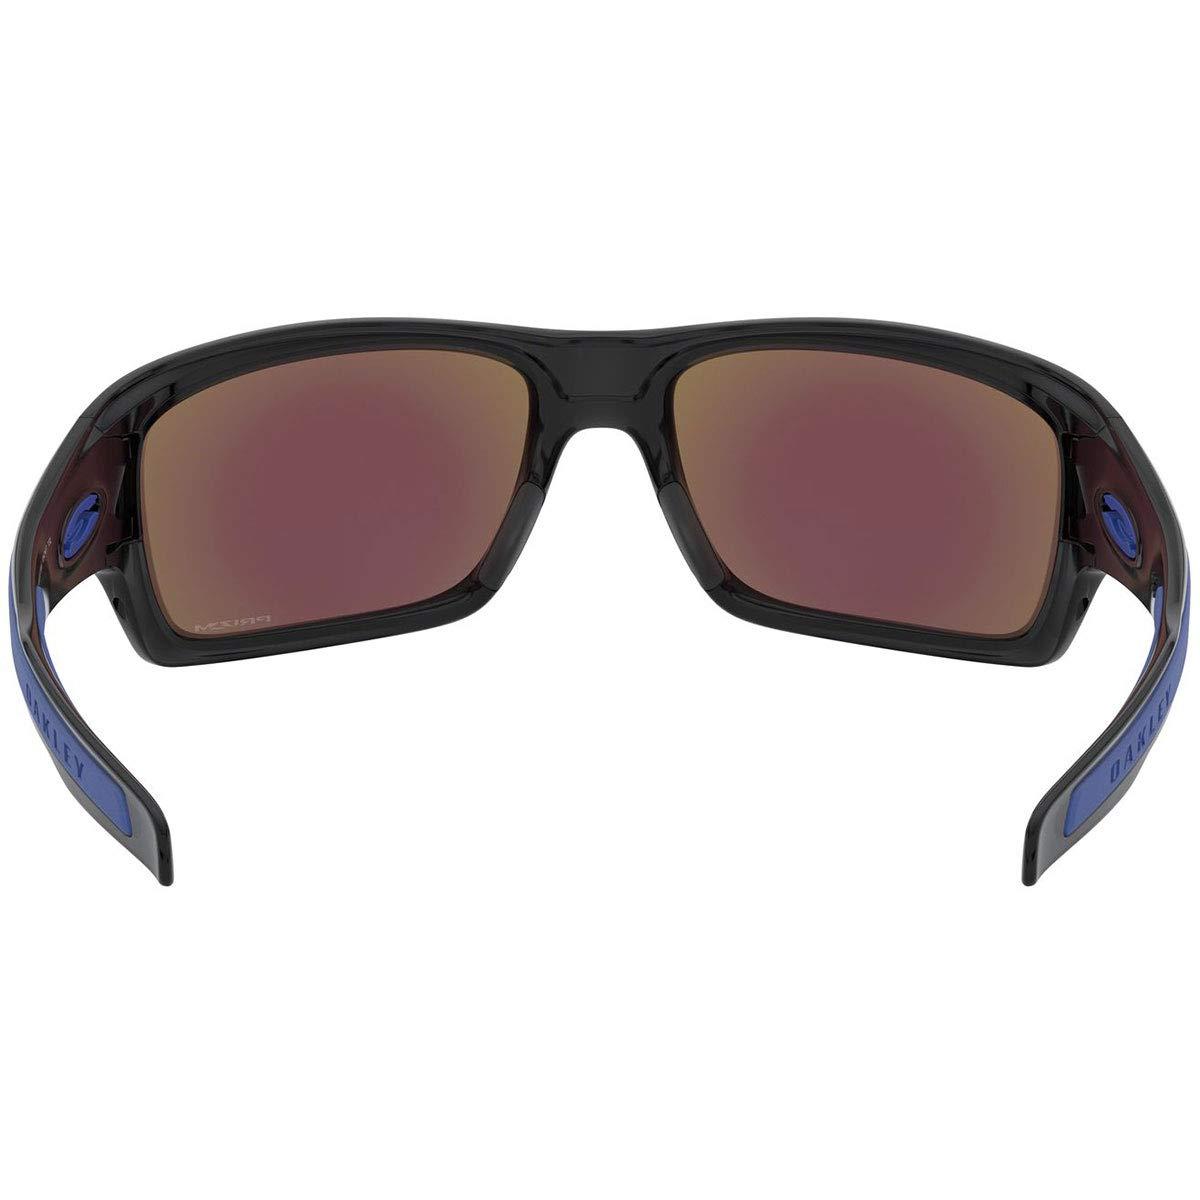 62f43e3321 Amazon.com: Oakley Men's Turbine Rectangular Sunglasses, Black Ink, 65 mm:  Clothing